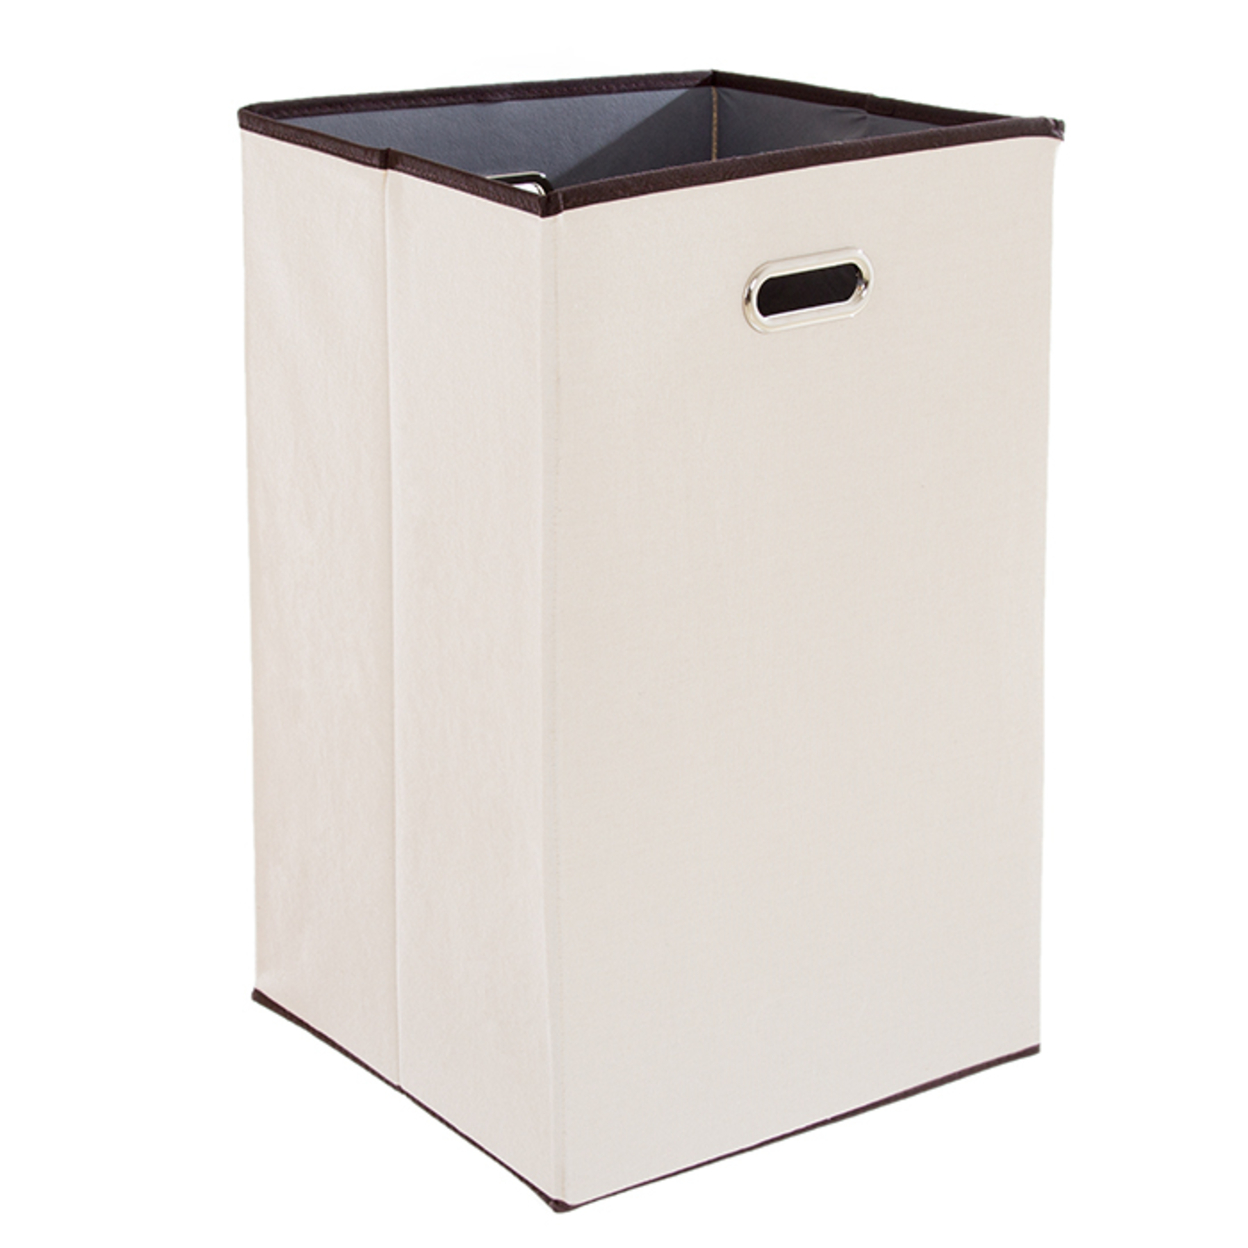 Lavish Home Folding 23 Inch Canvas Laundry Hamper Beige